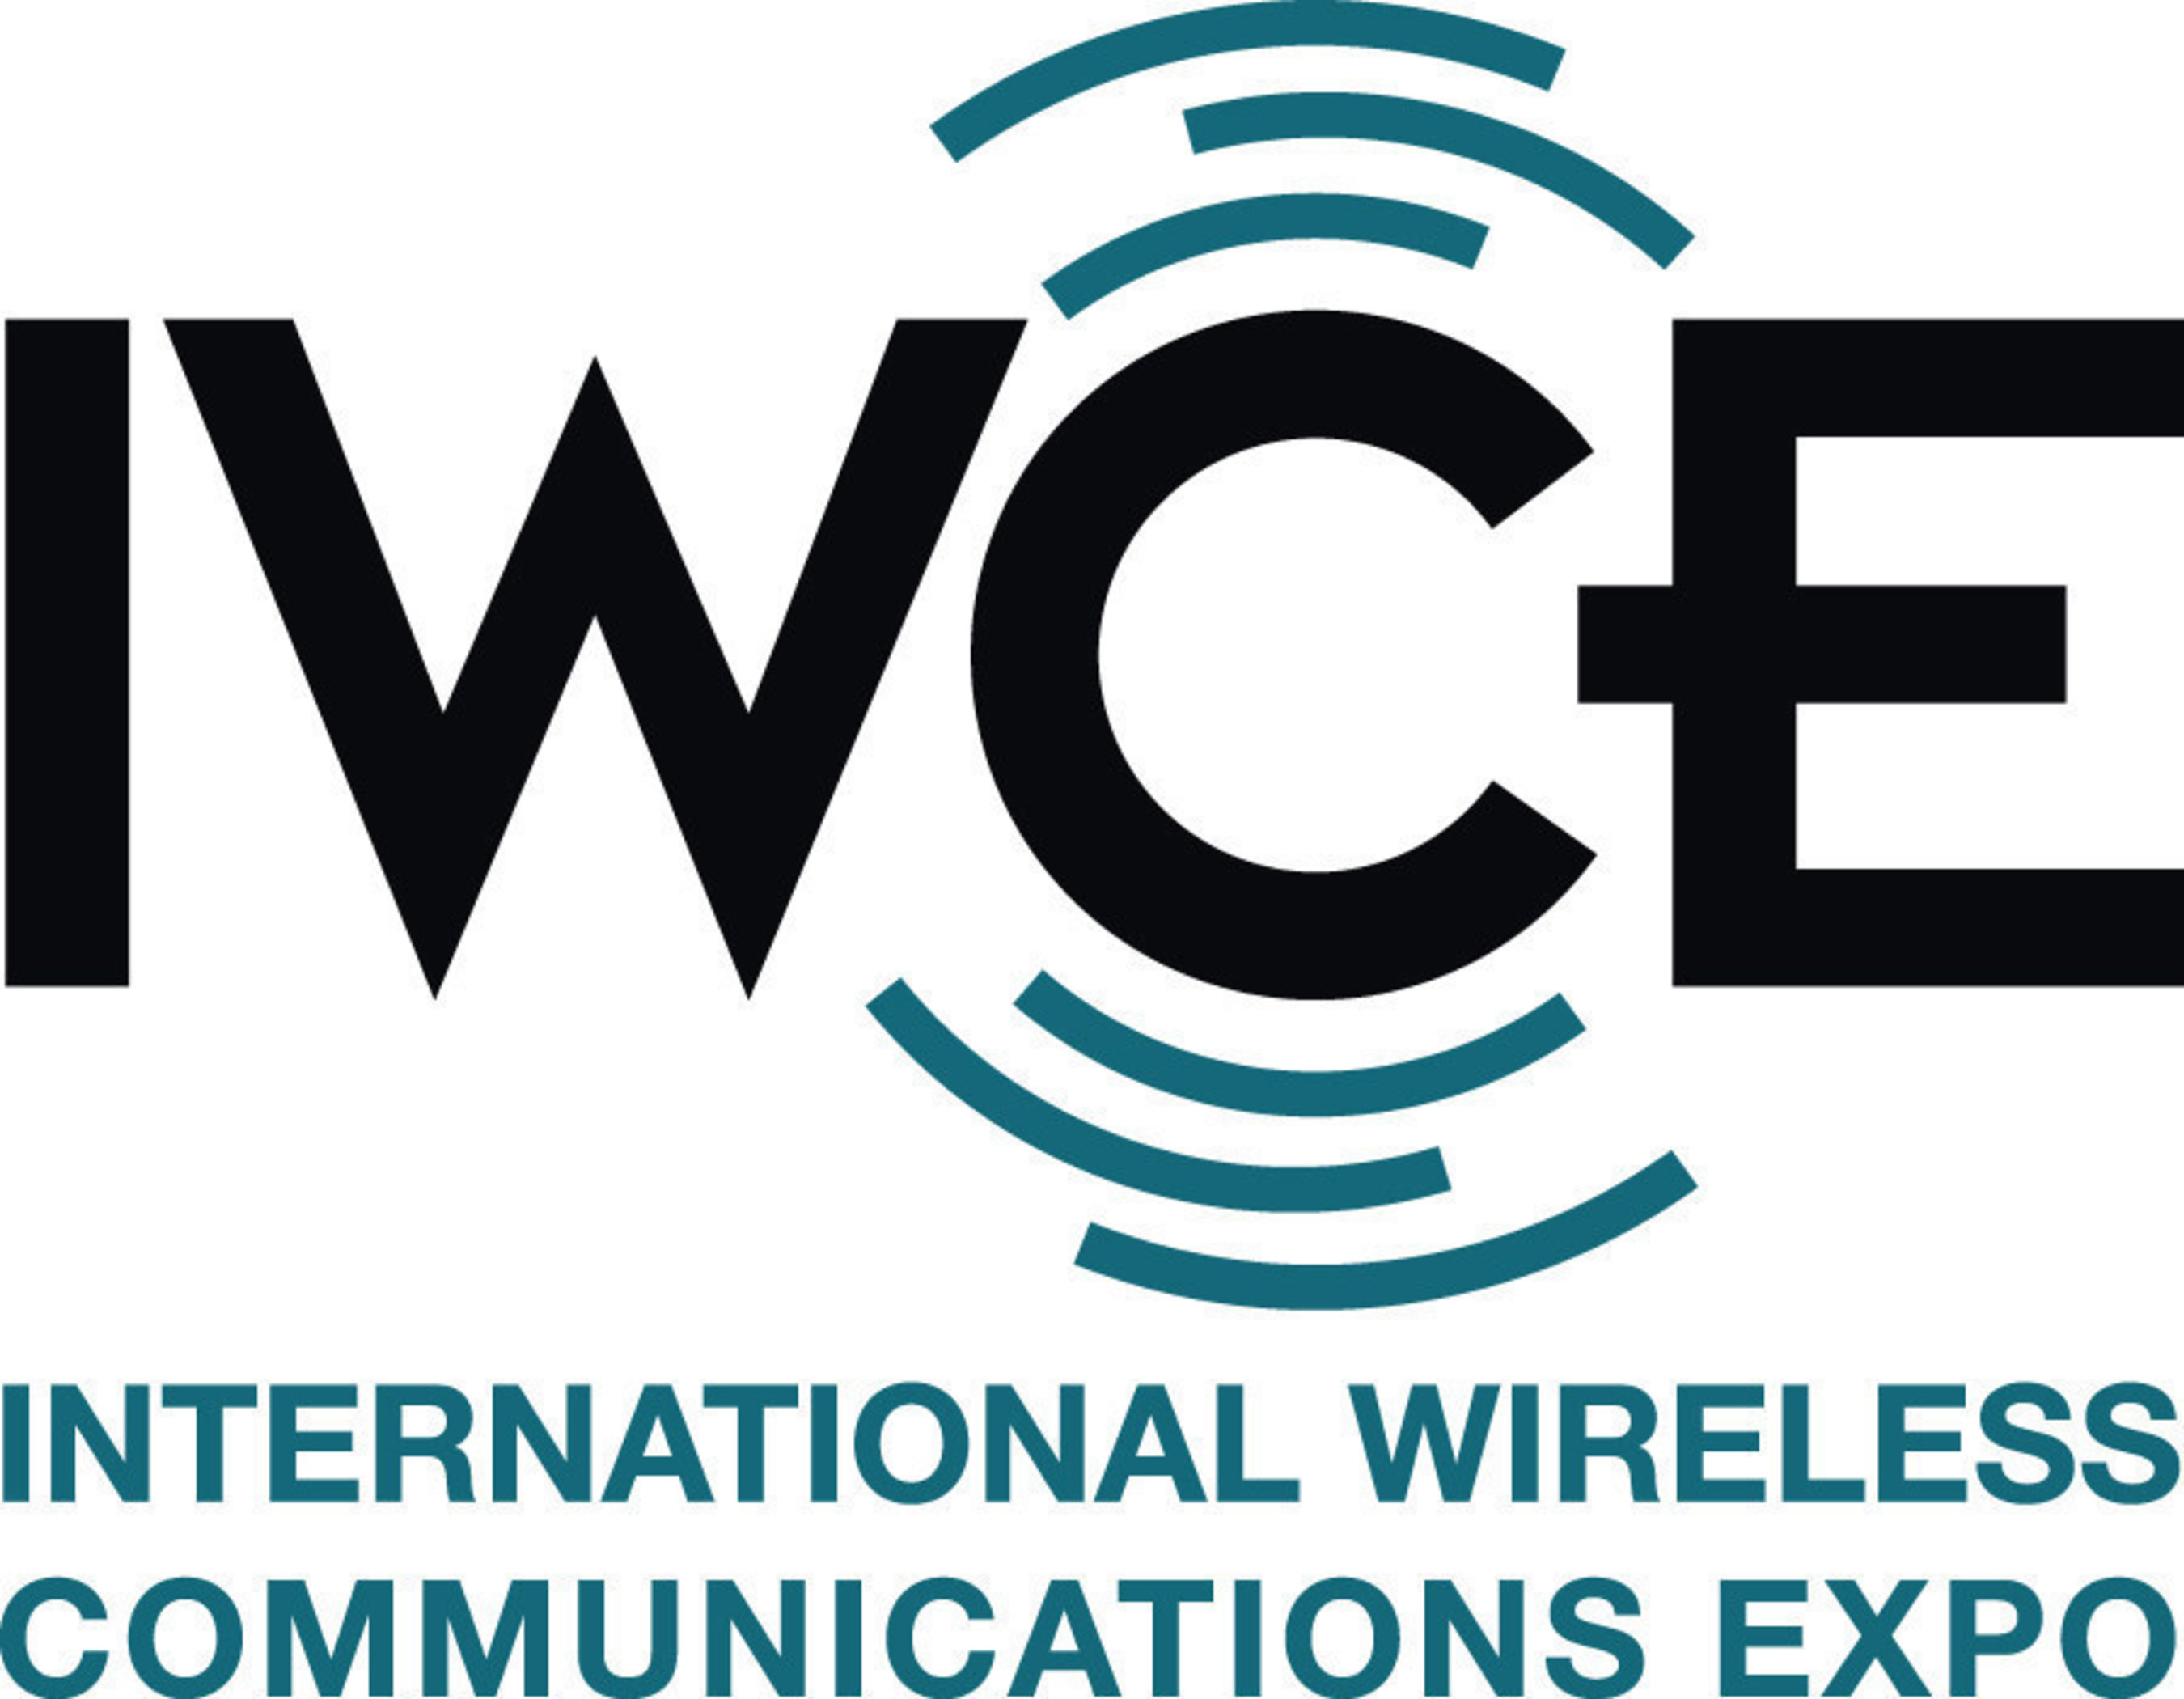 Penton's International Wireless Communication Expo (IWCE) Conference Program Educates the Communications Technology Industry